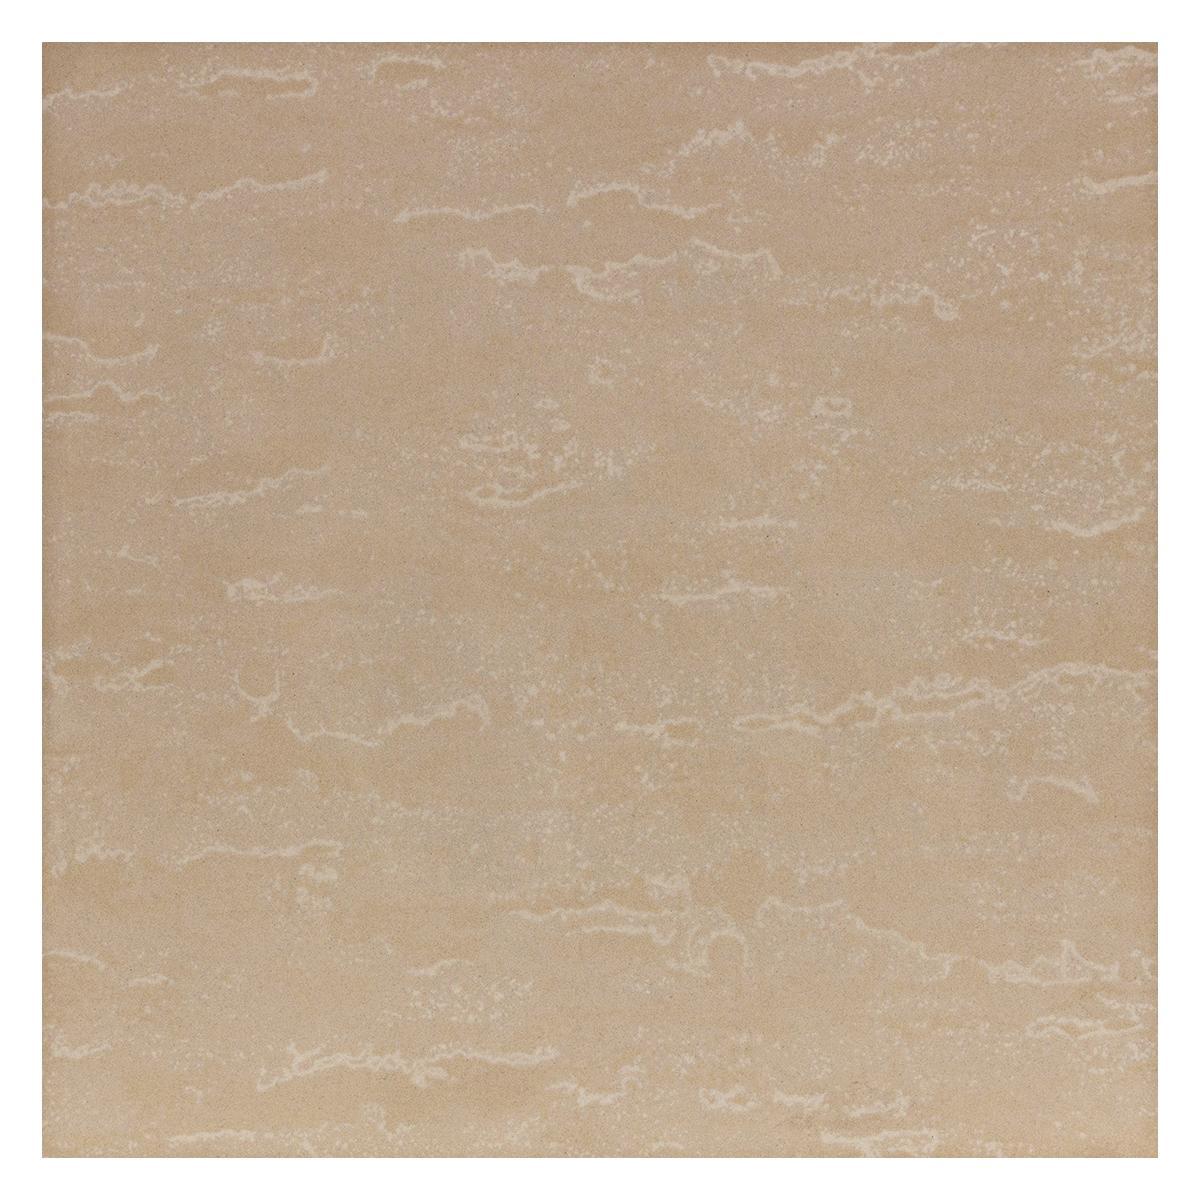 Porcelanato Marmol Marfil Brillante - 60X60 cm - 1.44 m2